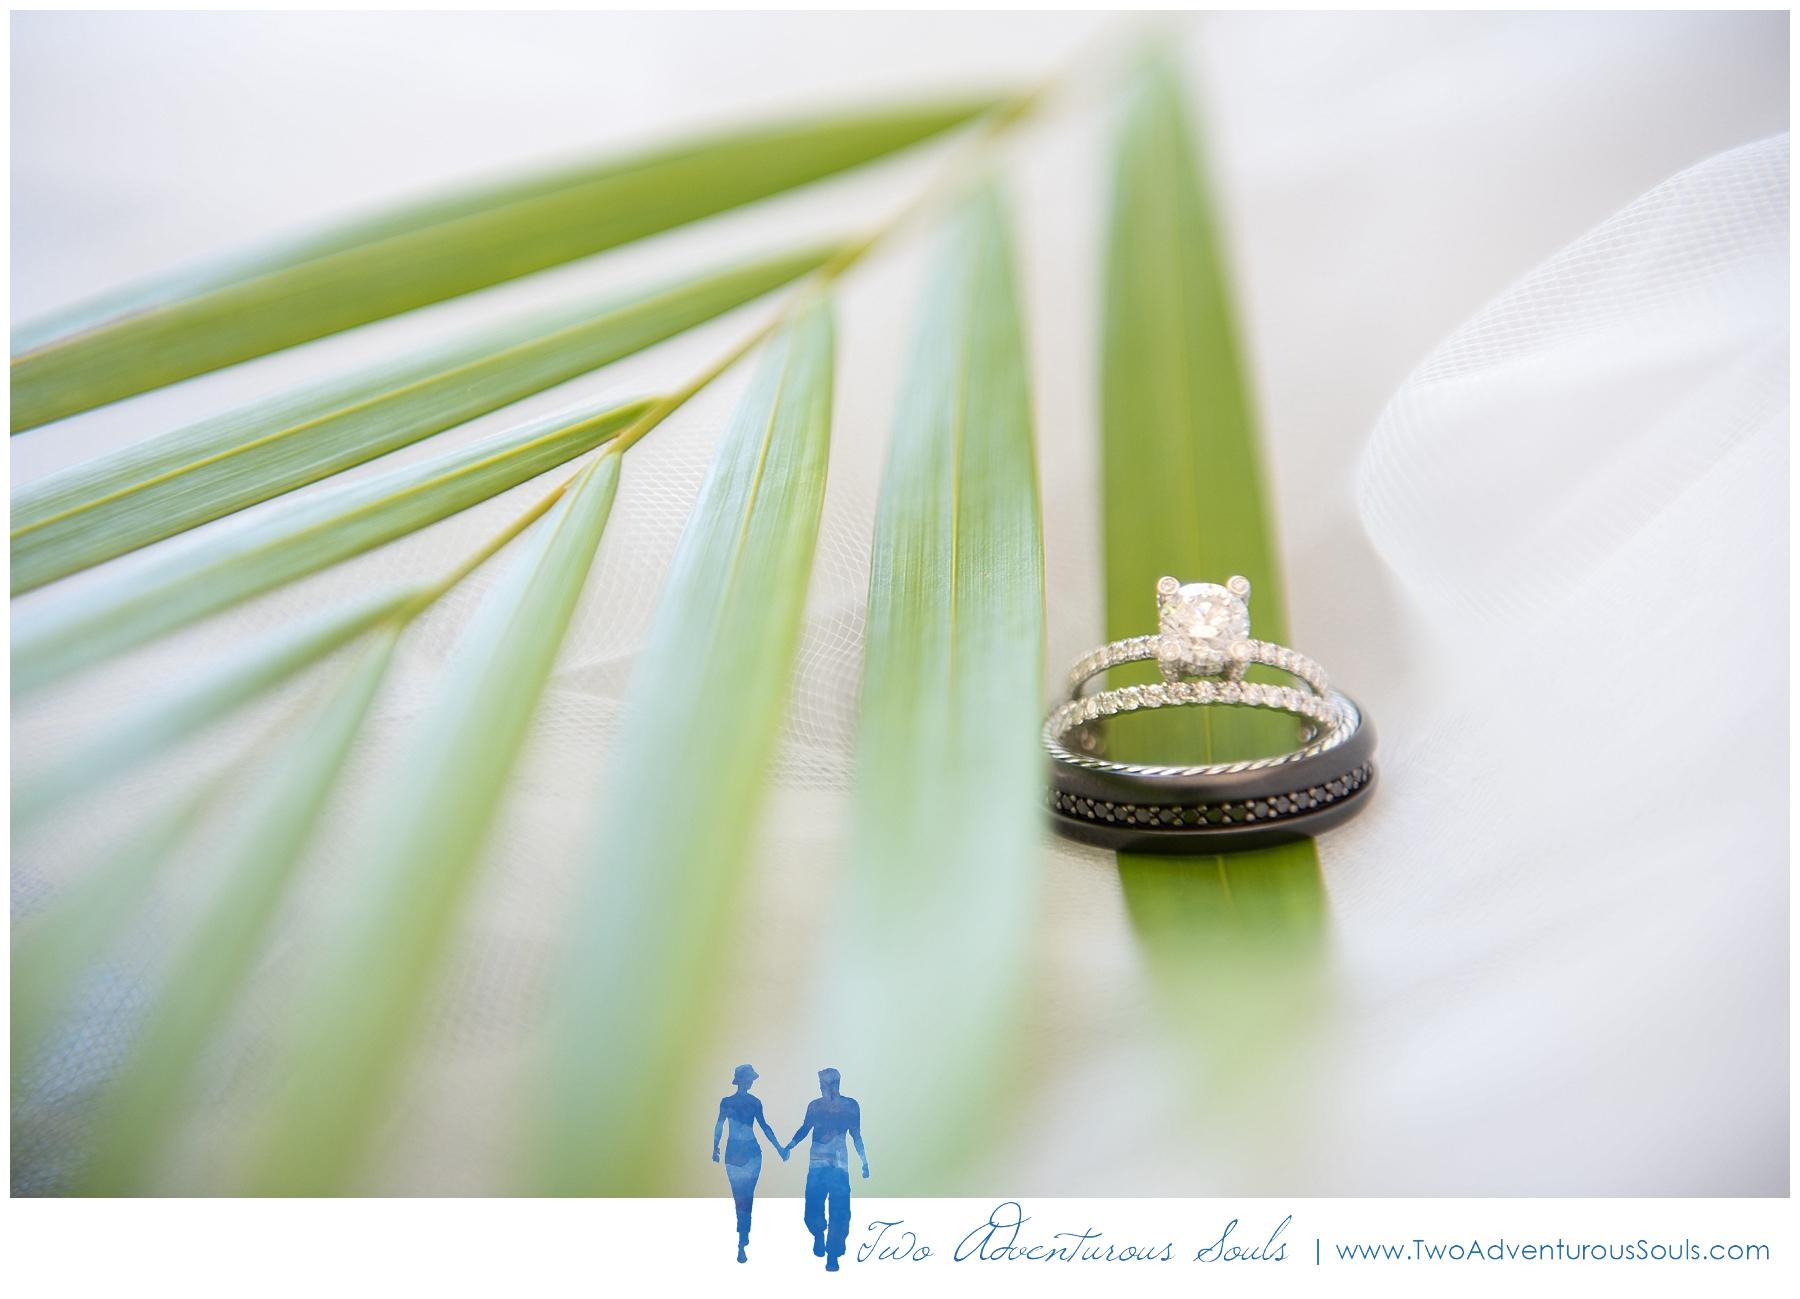 Costa Rica Wedding Photographers, Dreams las Mareas Wedding, Destination Wedding Photographers, Two Adventurous Souls - 022219_0003.jpg